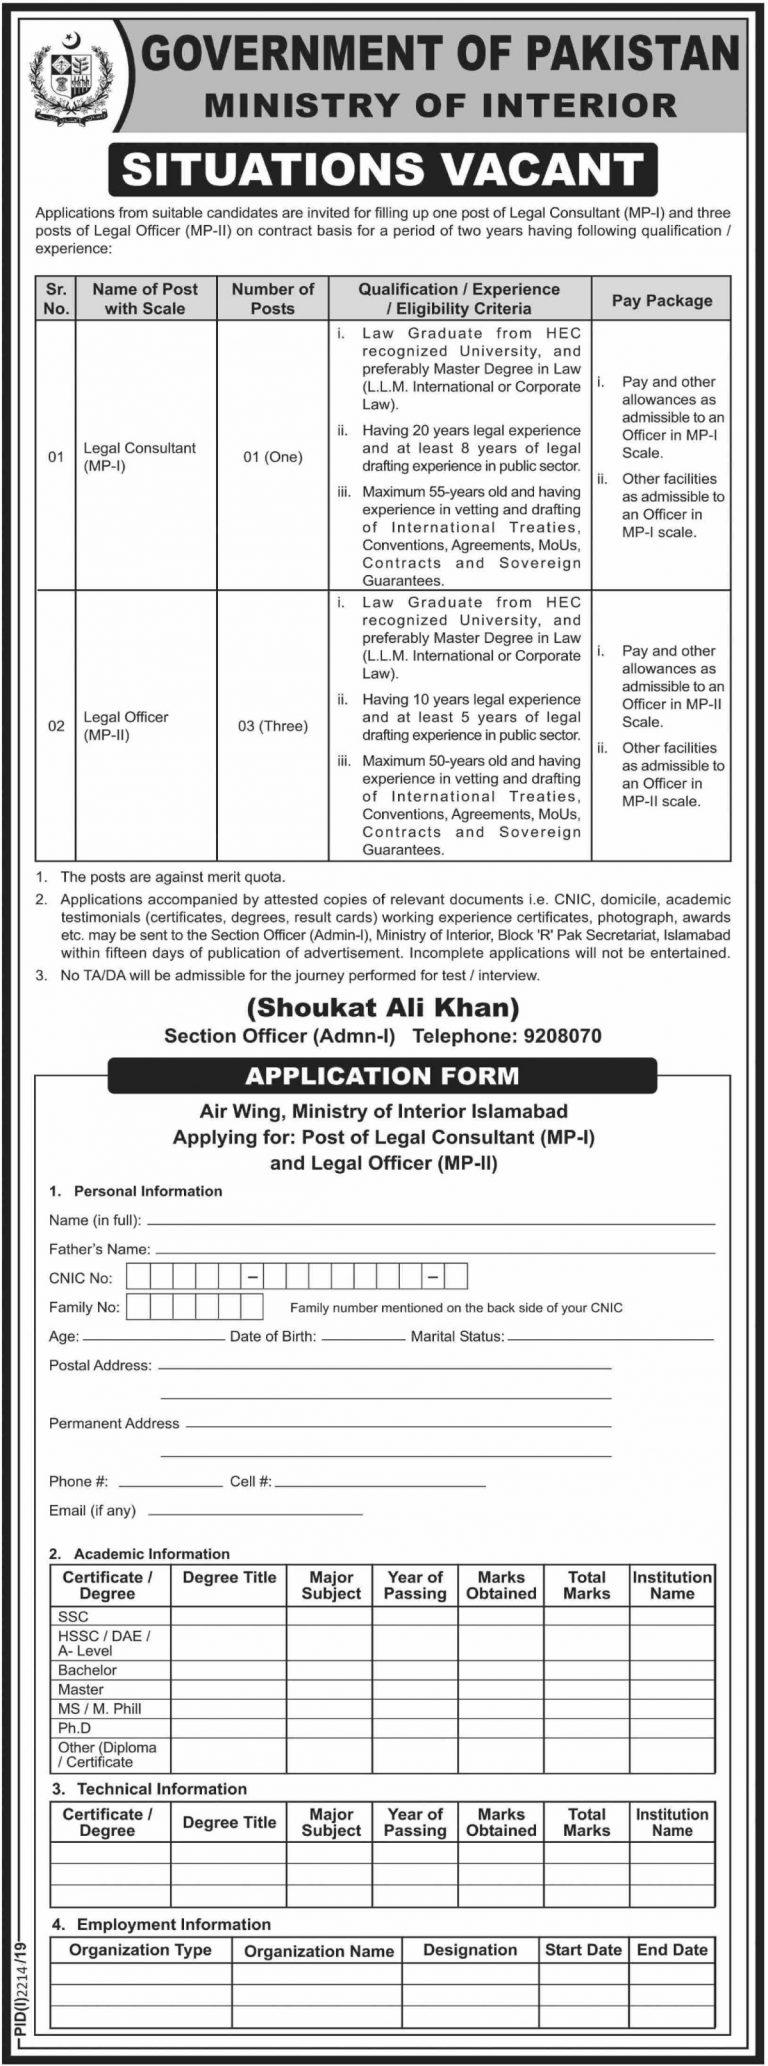 Ministry of Interior Jobs 2019 Application Form Online Download | www.interior.gov.pk